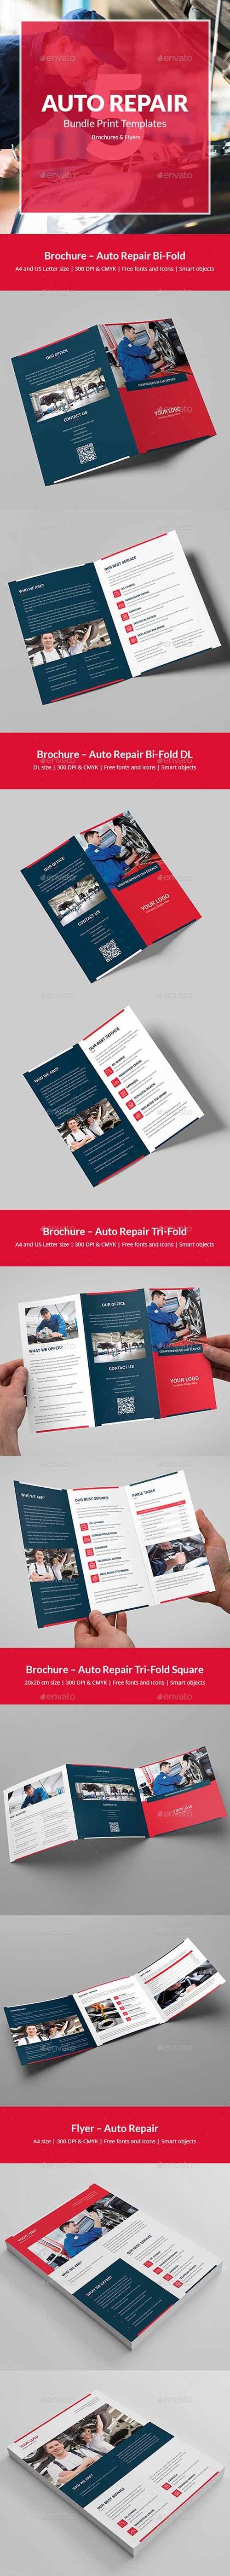 Auto Repair – Bundle Print Templates 5 in 1 21294221